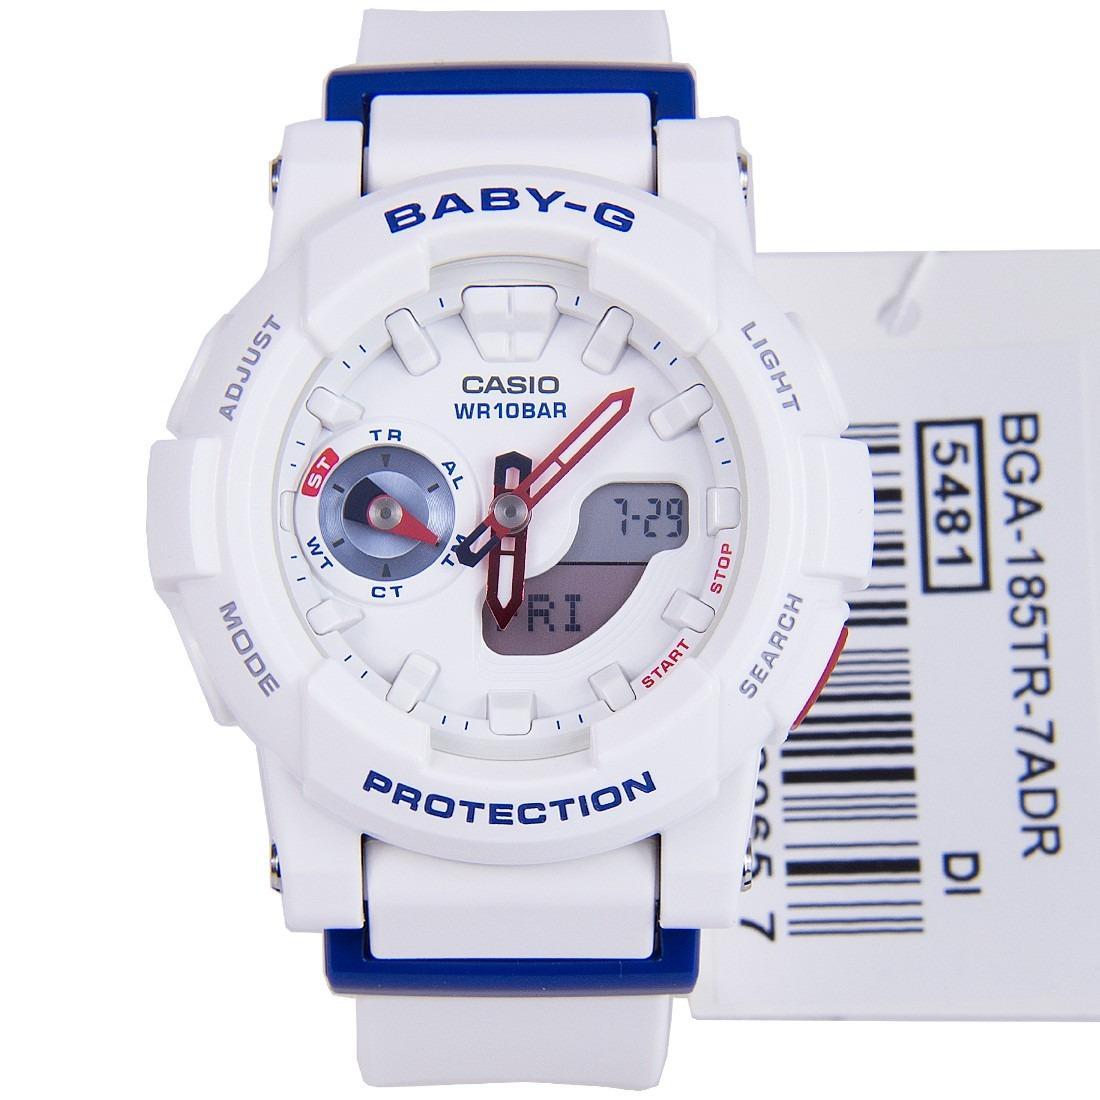 Casio Baby G Bga 150ef 4b Pink Intl Singapore Price Specs Original Marine Tricolor 185tr 7a 7adr